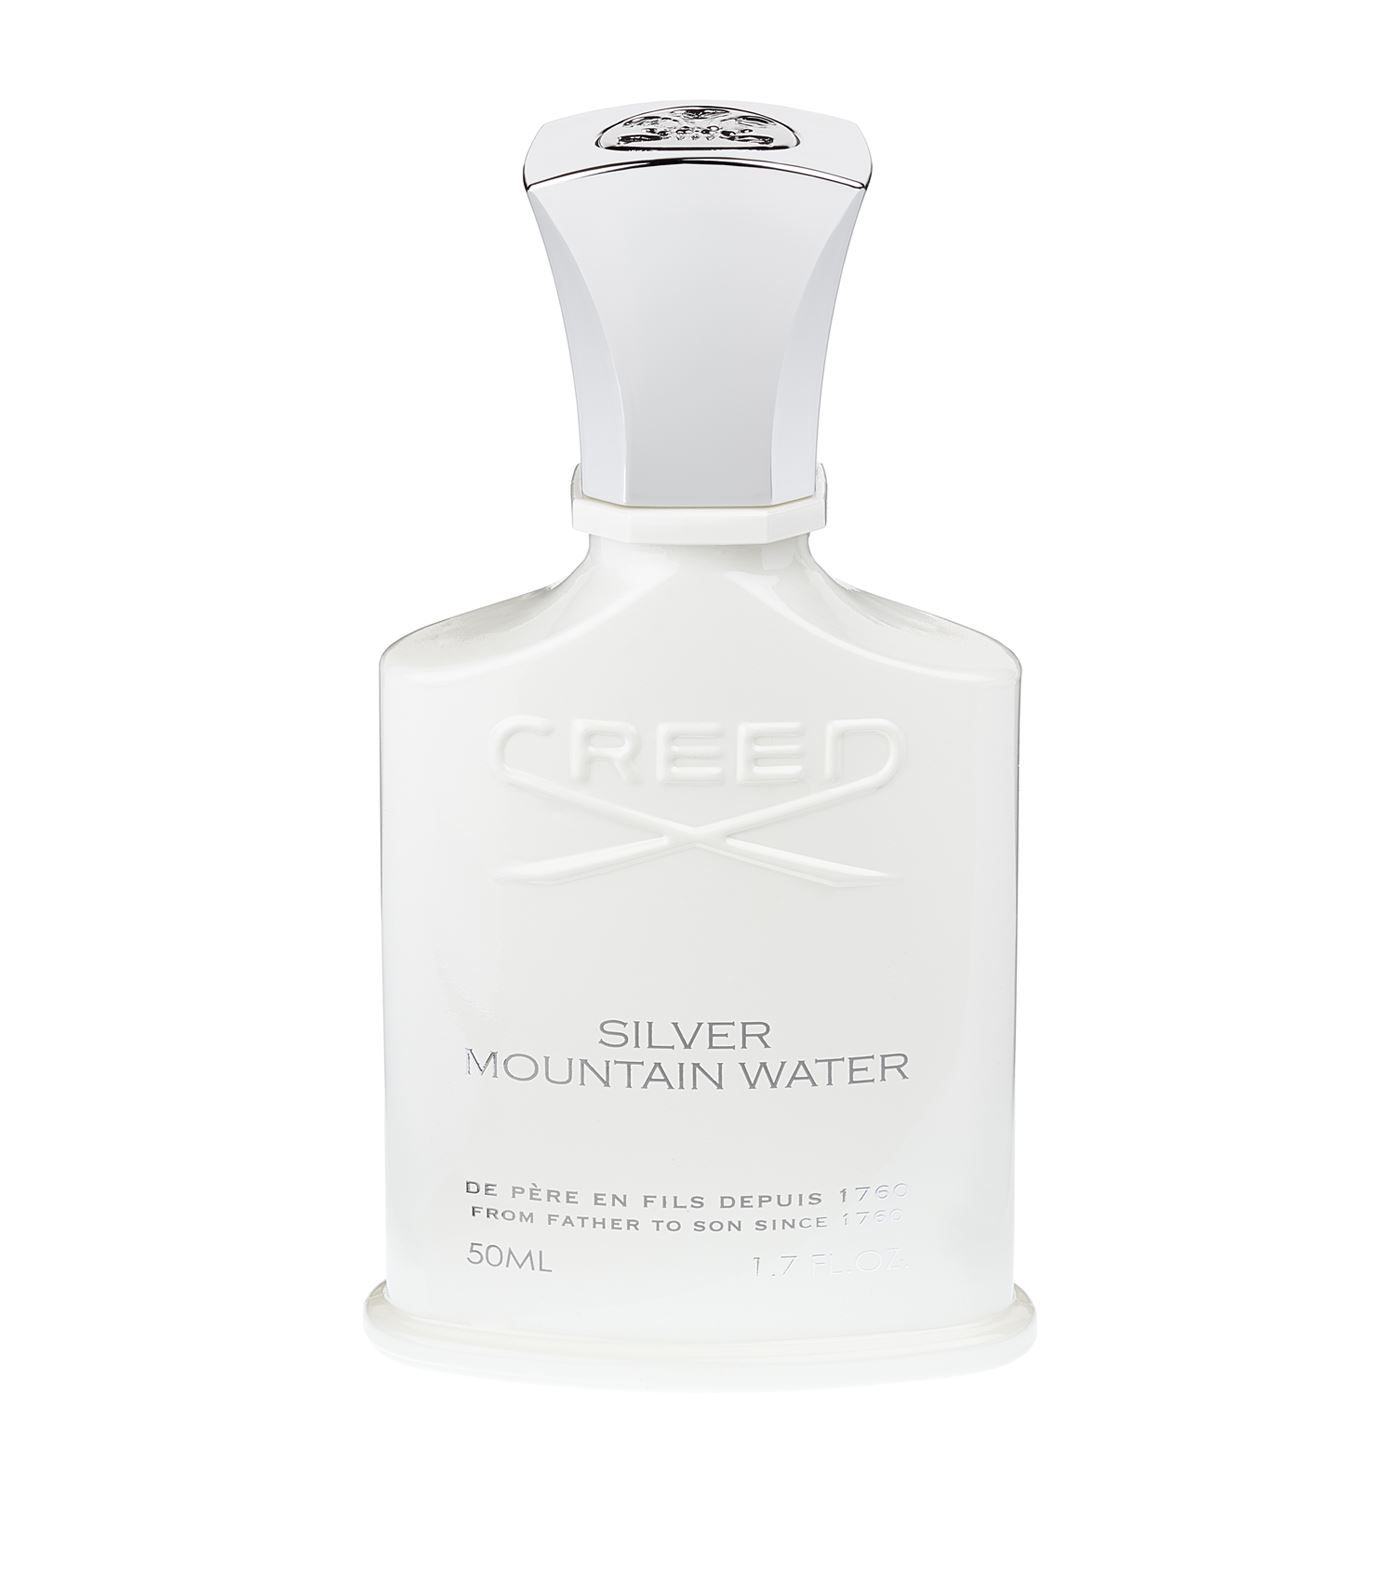 Creed Silver Mountain Water Eau De Parfum Creed Fragrance Bottle Fragrance Eau De Parfum